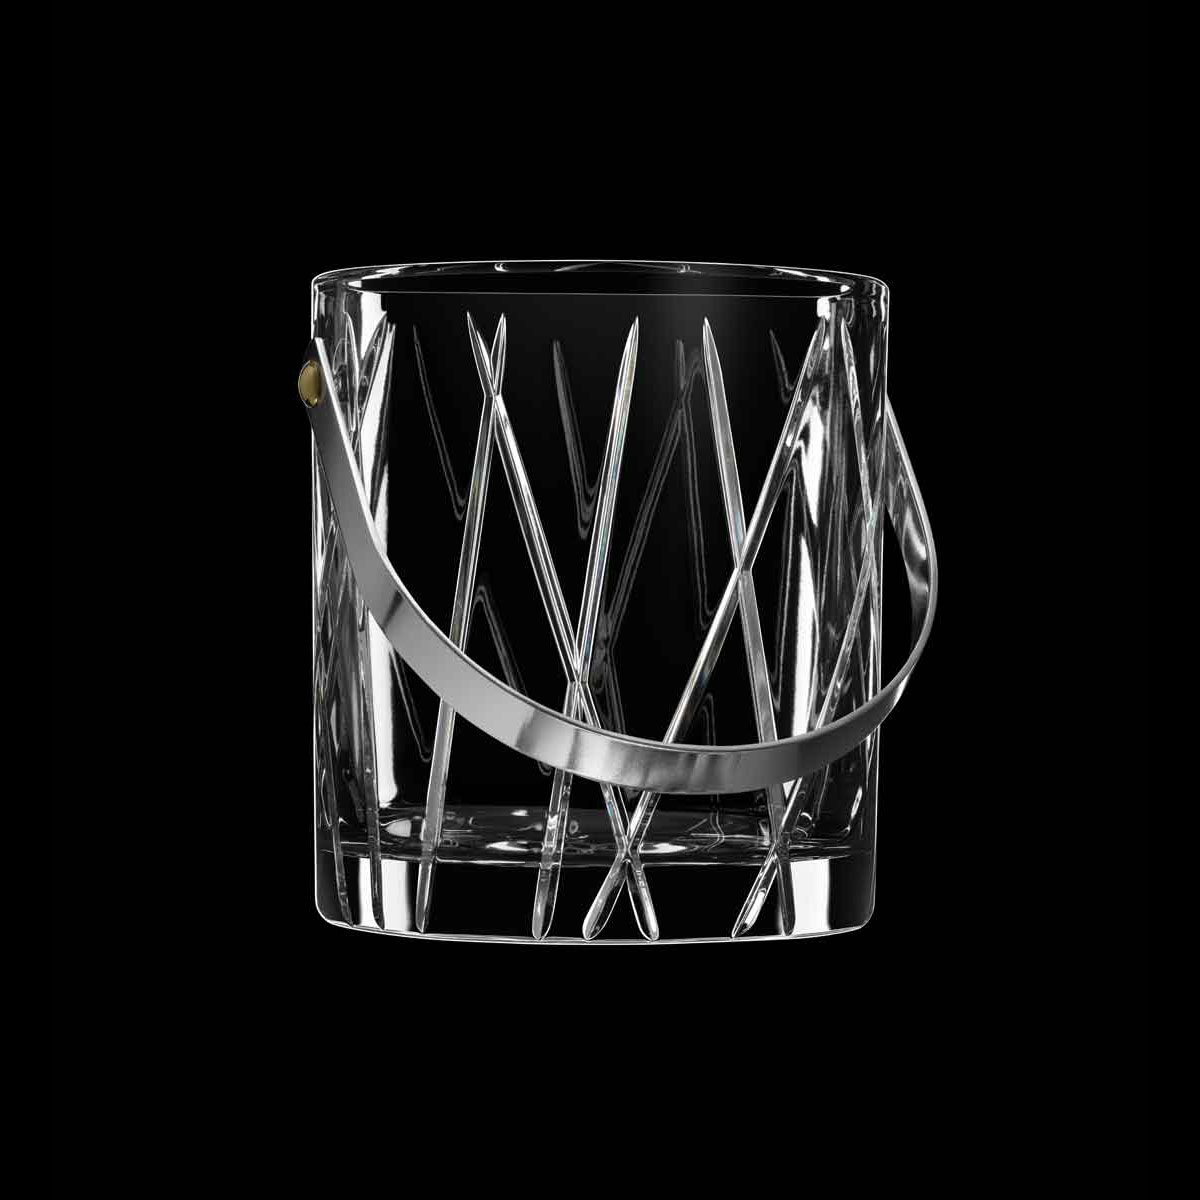 Orrefors Crystal, City Ice Bucket